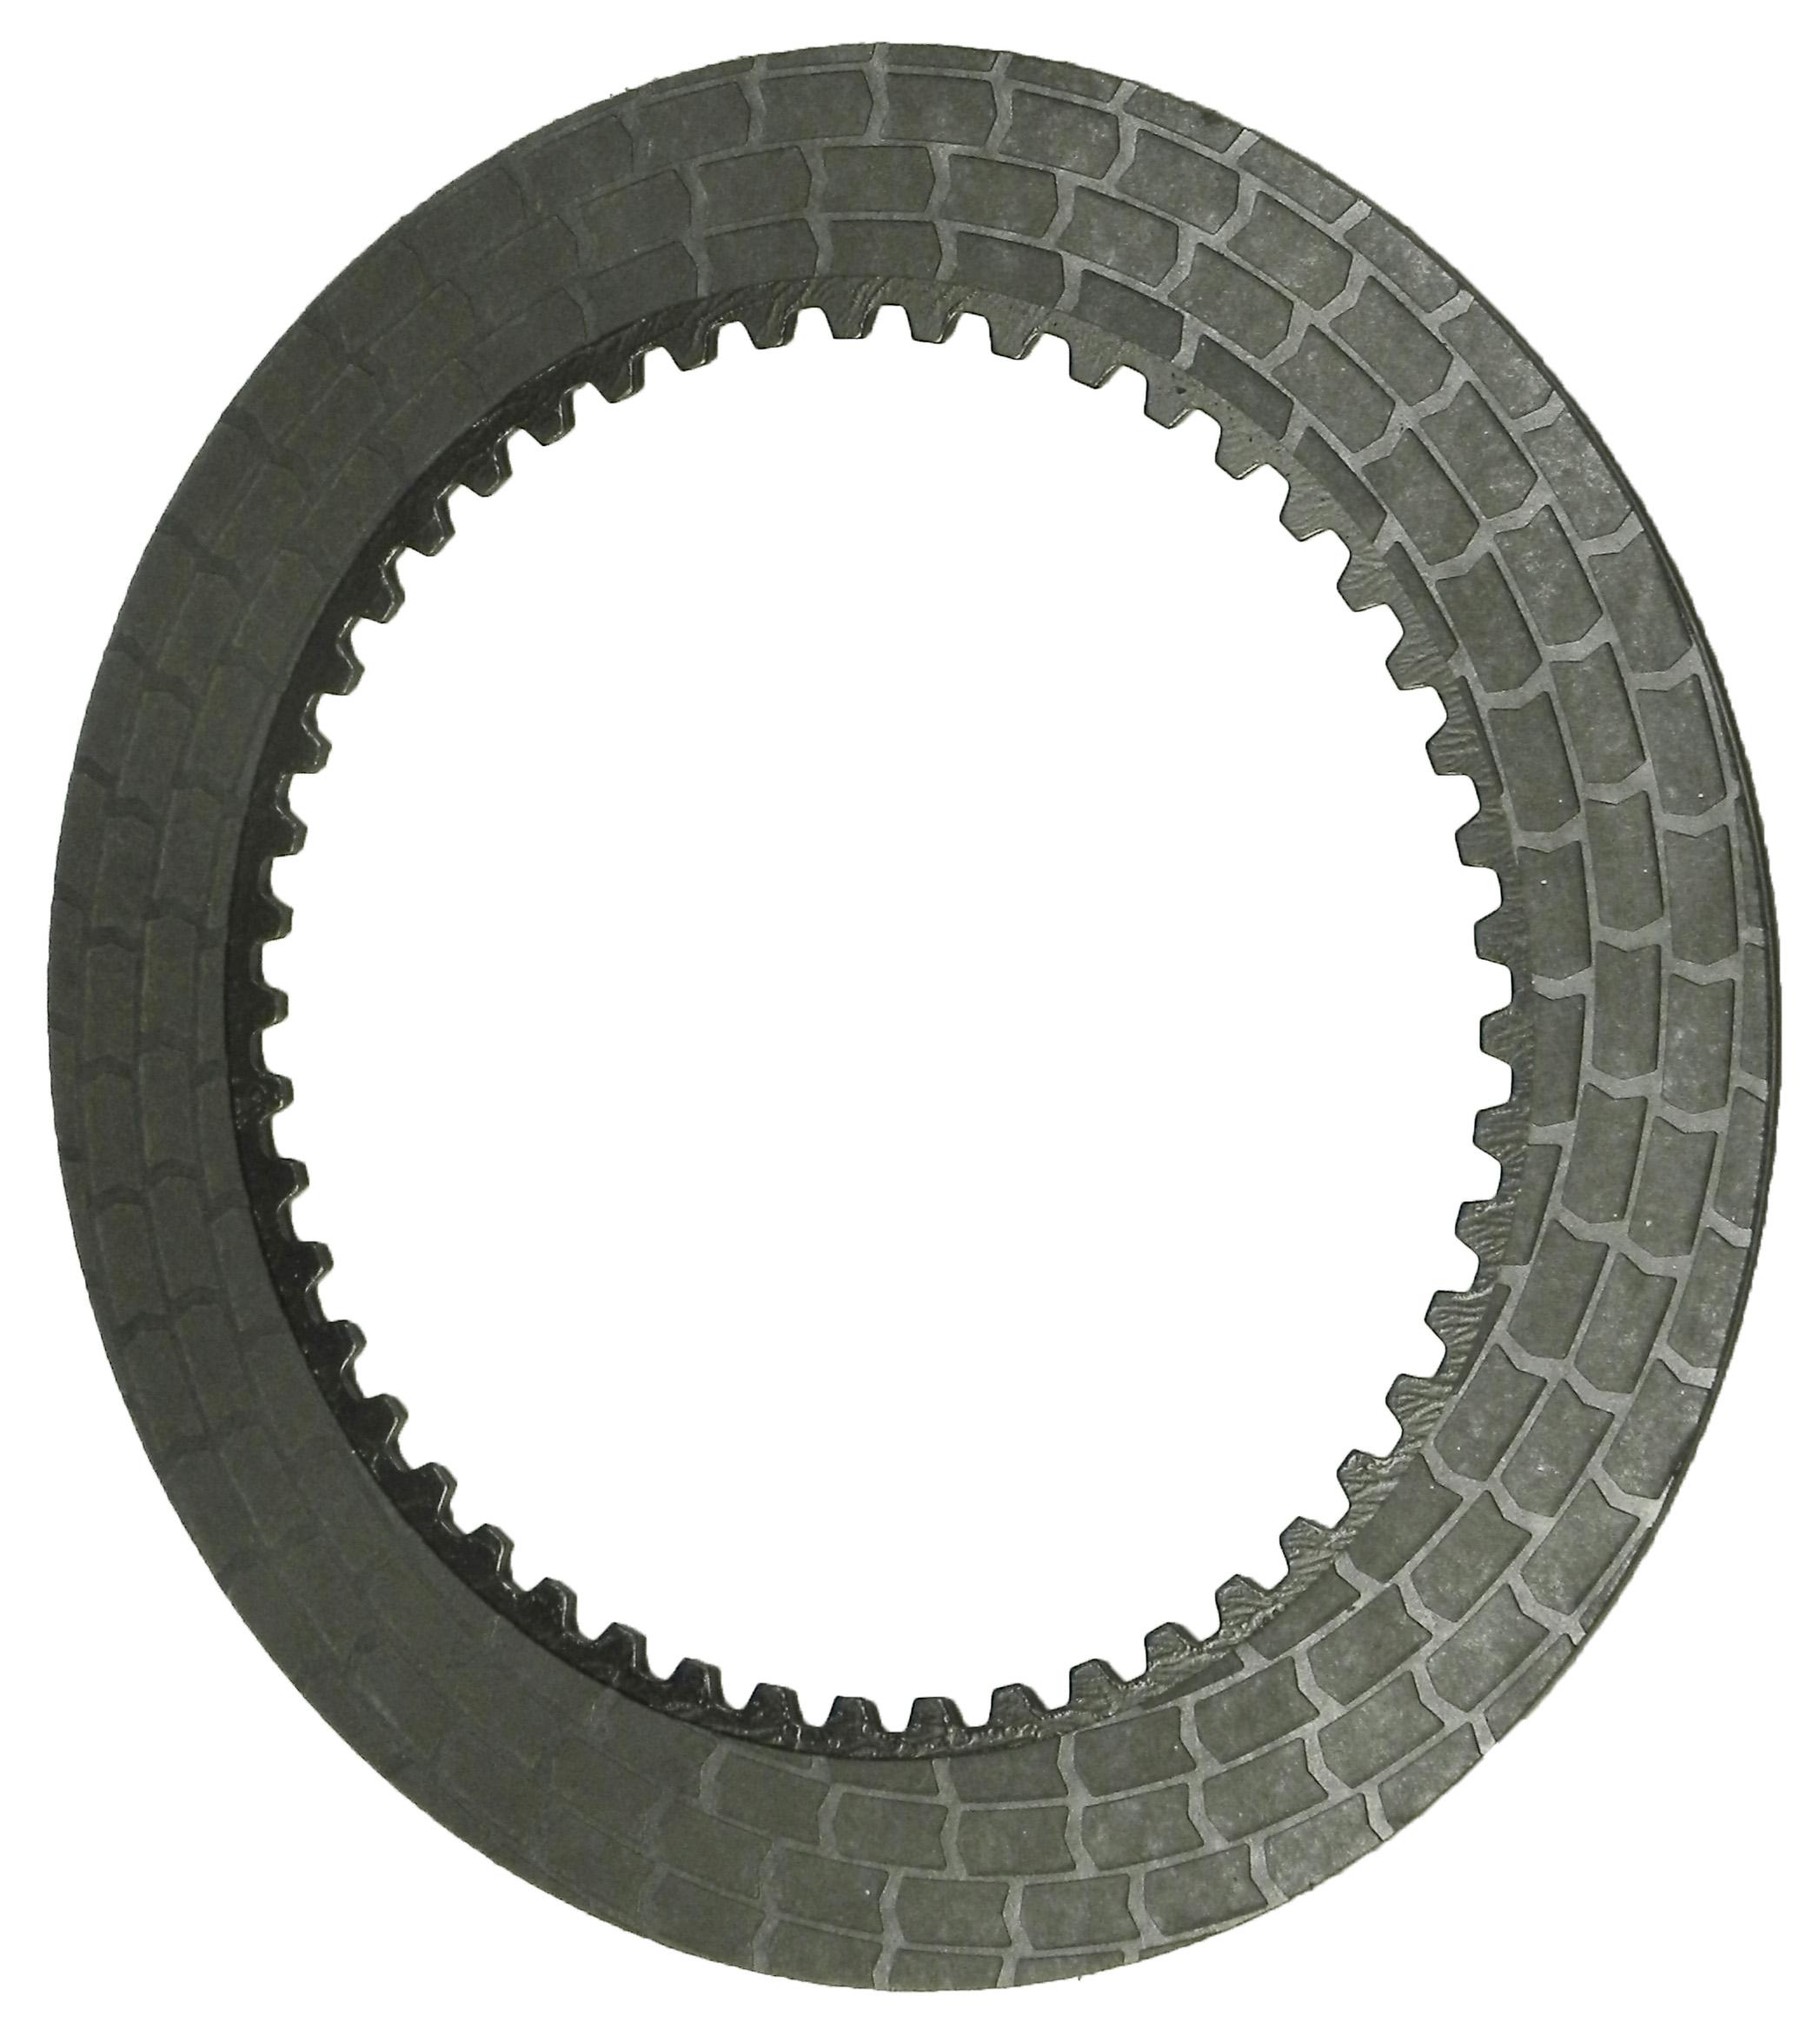 RH572030 | 1995-ON Friction Clutch Plate (HT) Hybrid Technology Reverse Clutch Proprietary High Energy (HT)